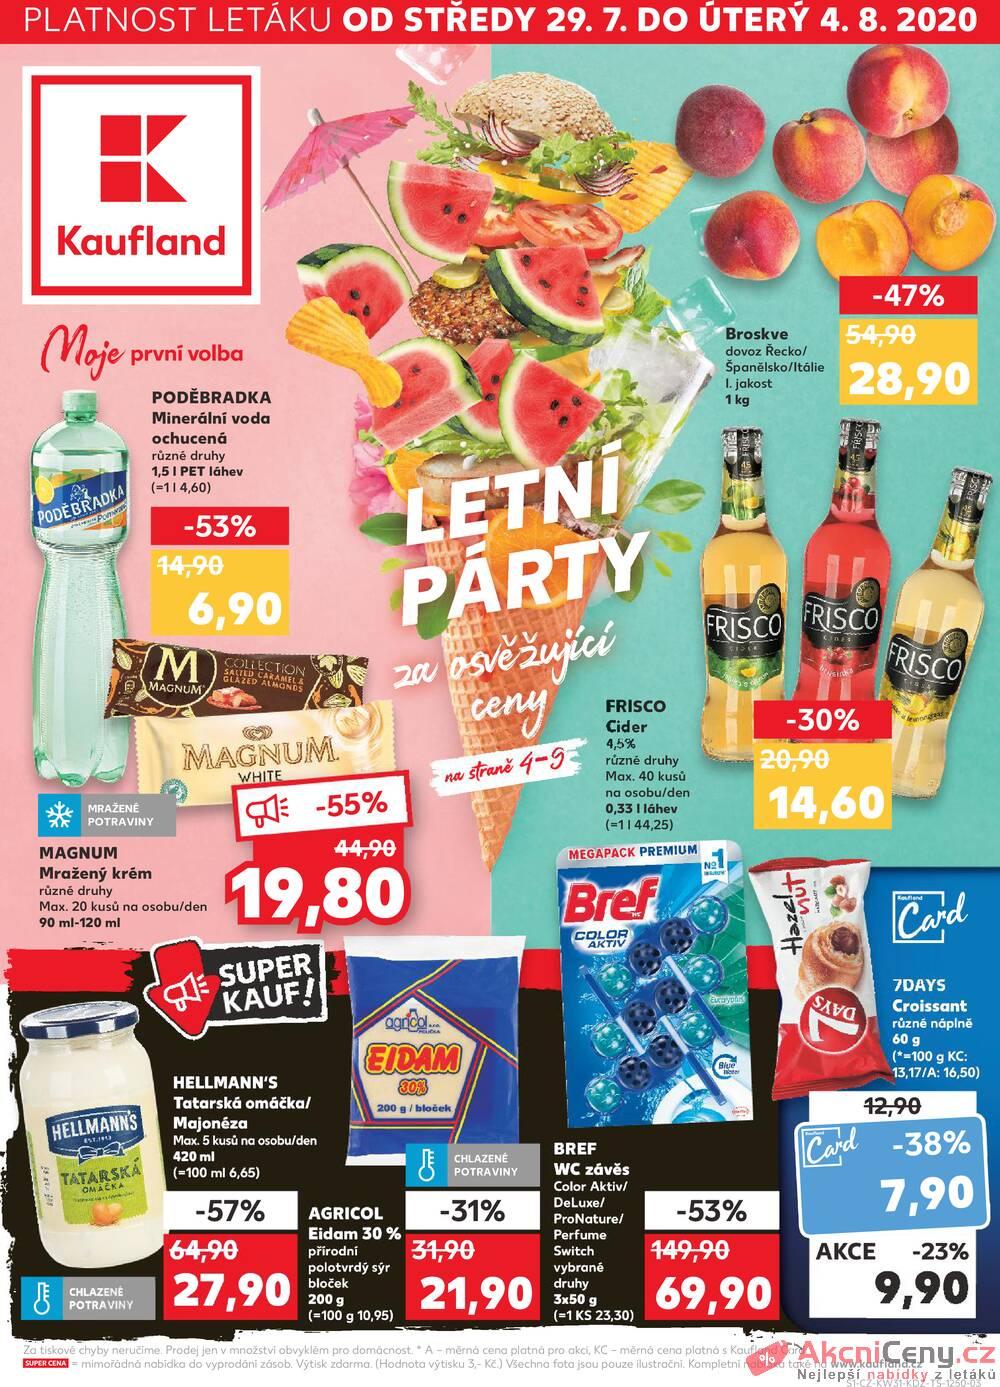 Leták Kaufland - Kaufland 29.7. - 4.8. - Kaufland - Ostrava - Zábřeh - strana 1